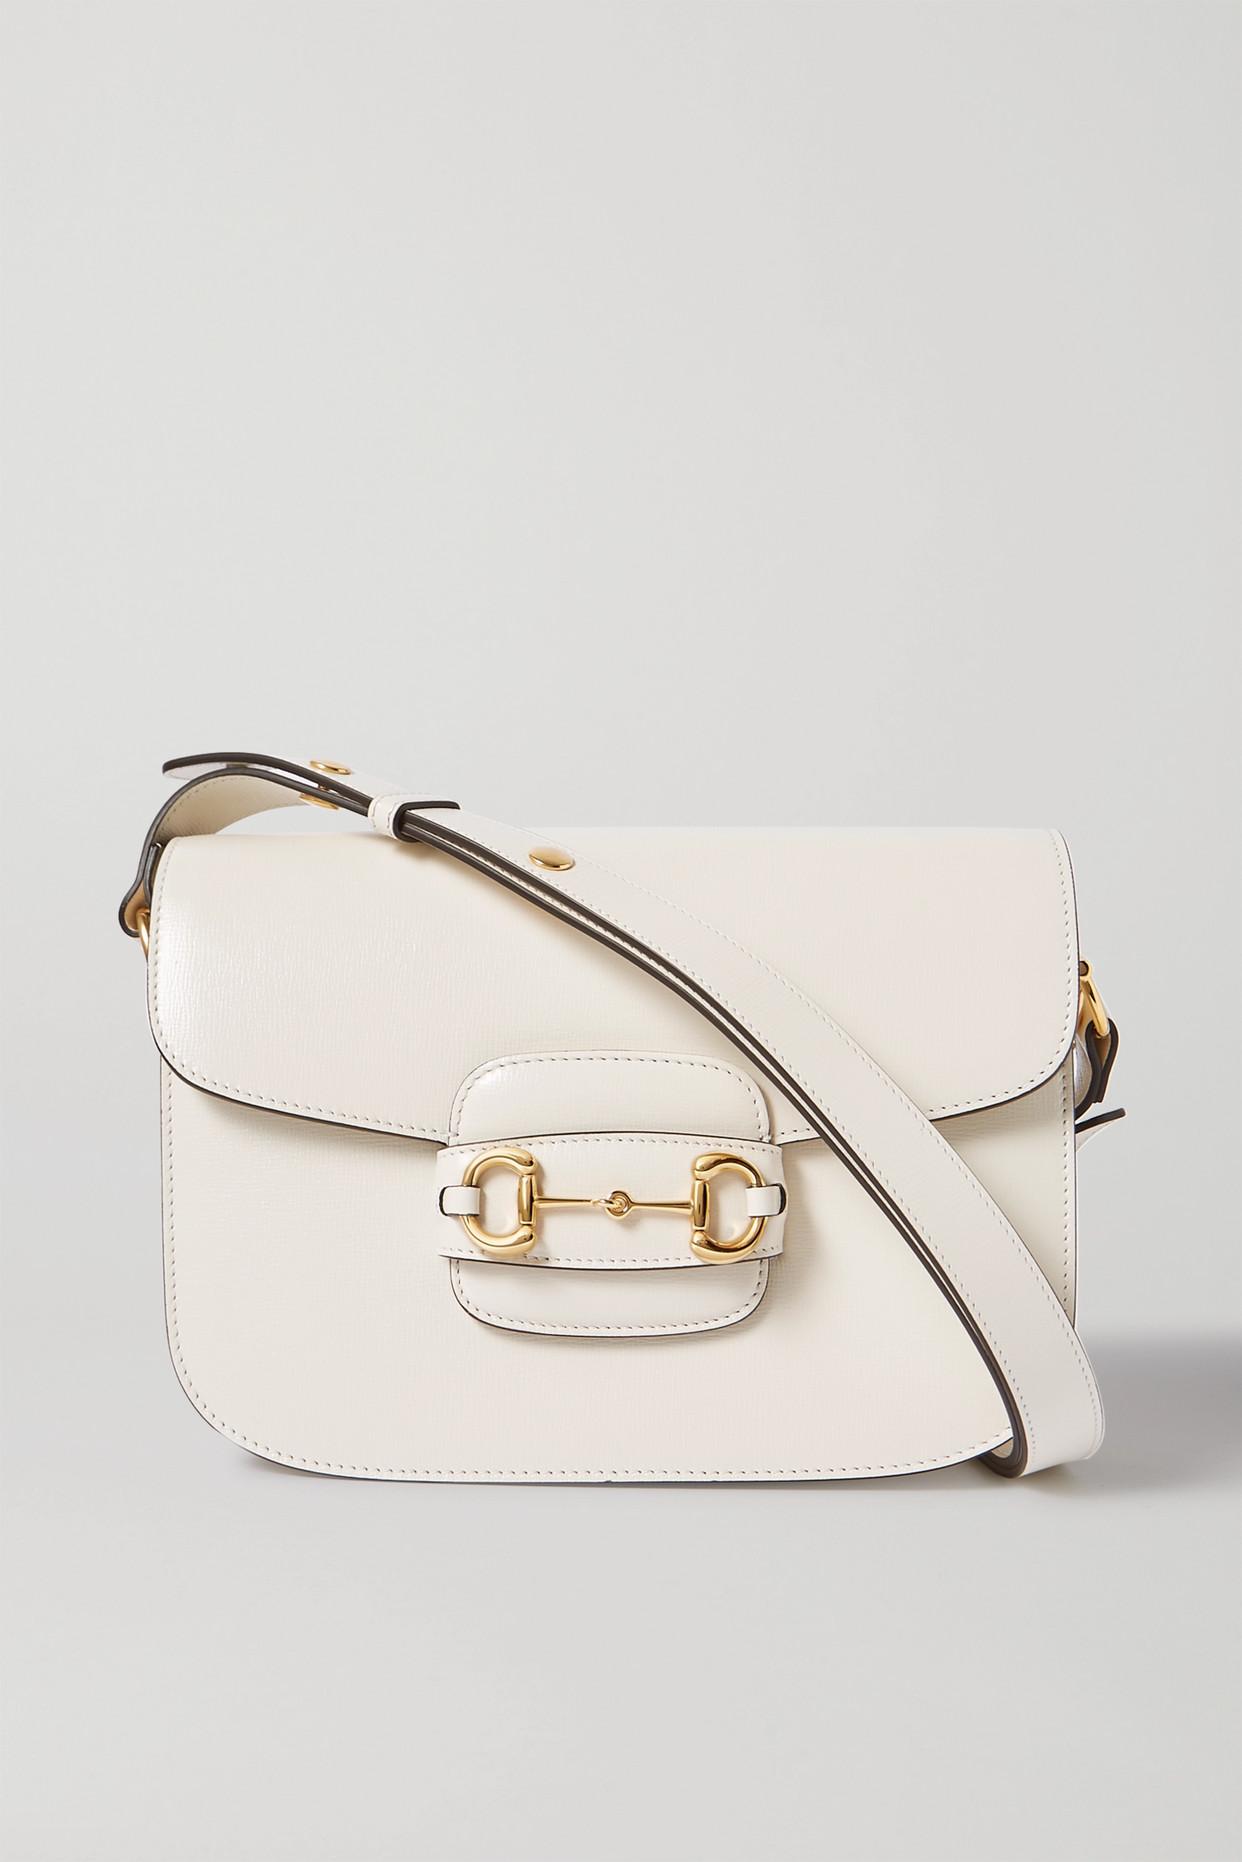 GUCCI - 1955 Horsebit-detailed Leather Shoulder Bag - White - one size